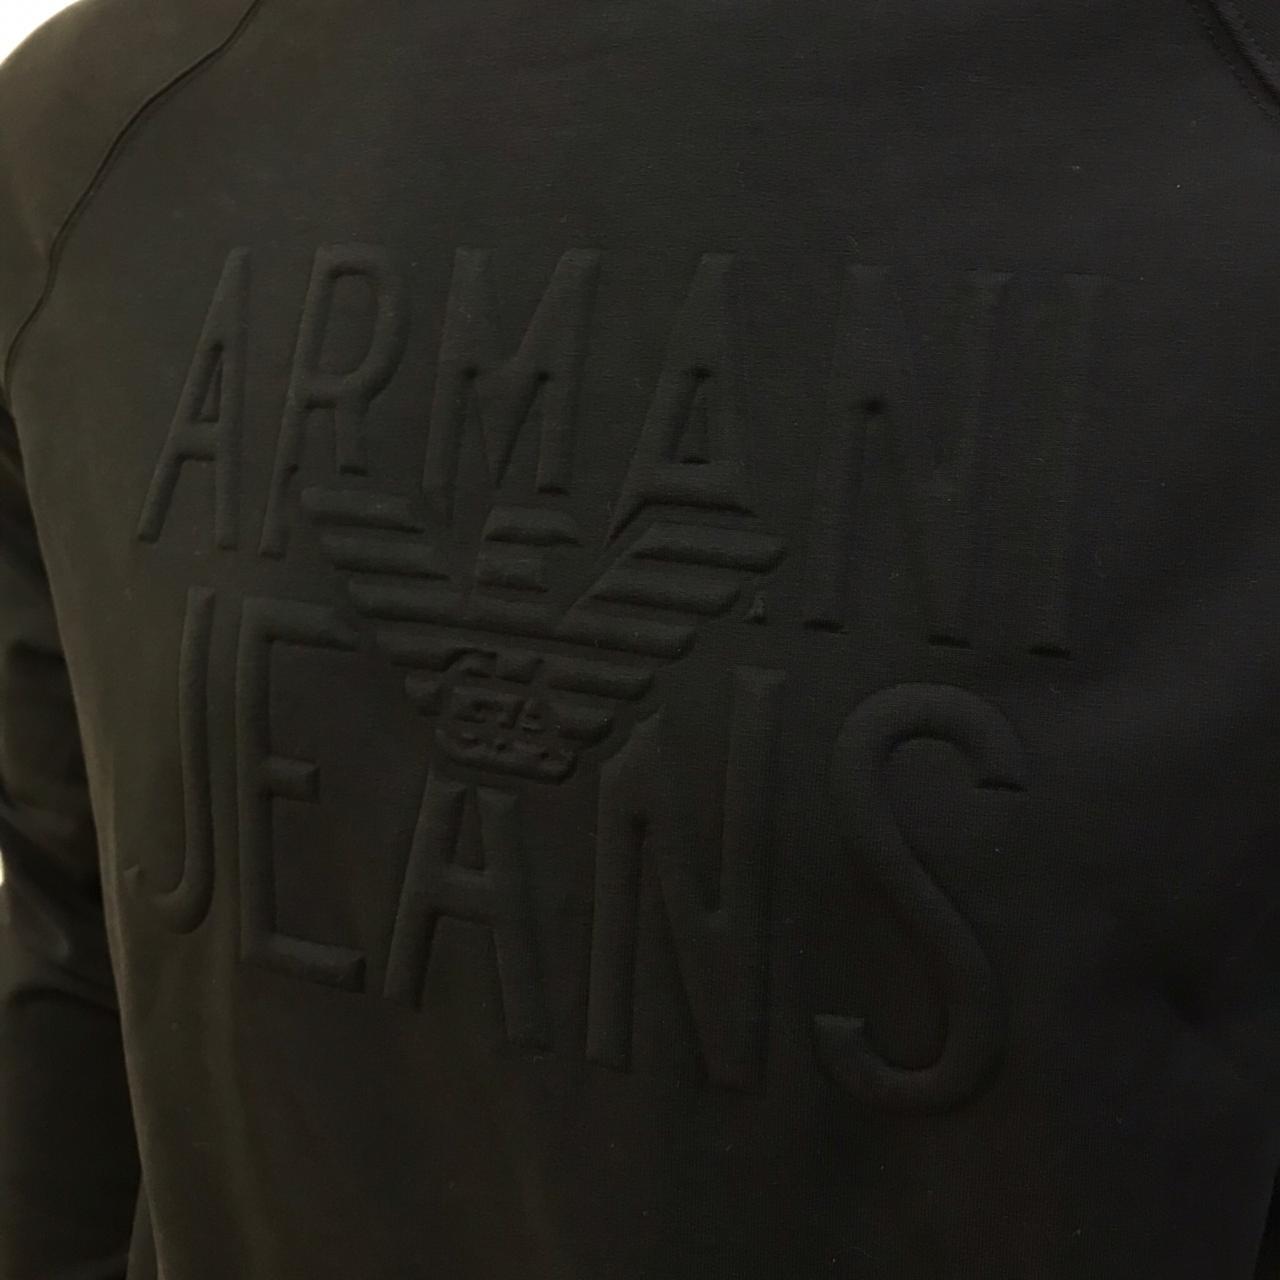 Moletom Armani Jeans com Estampa em Relevo preto